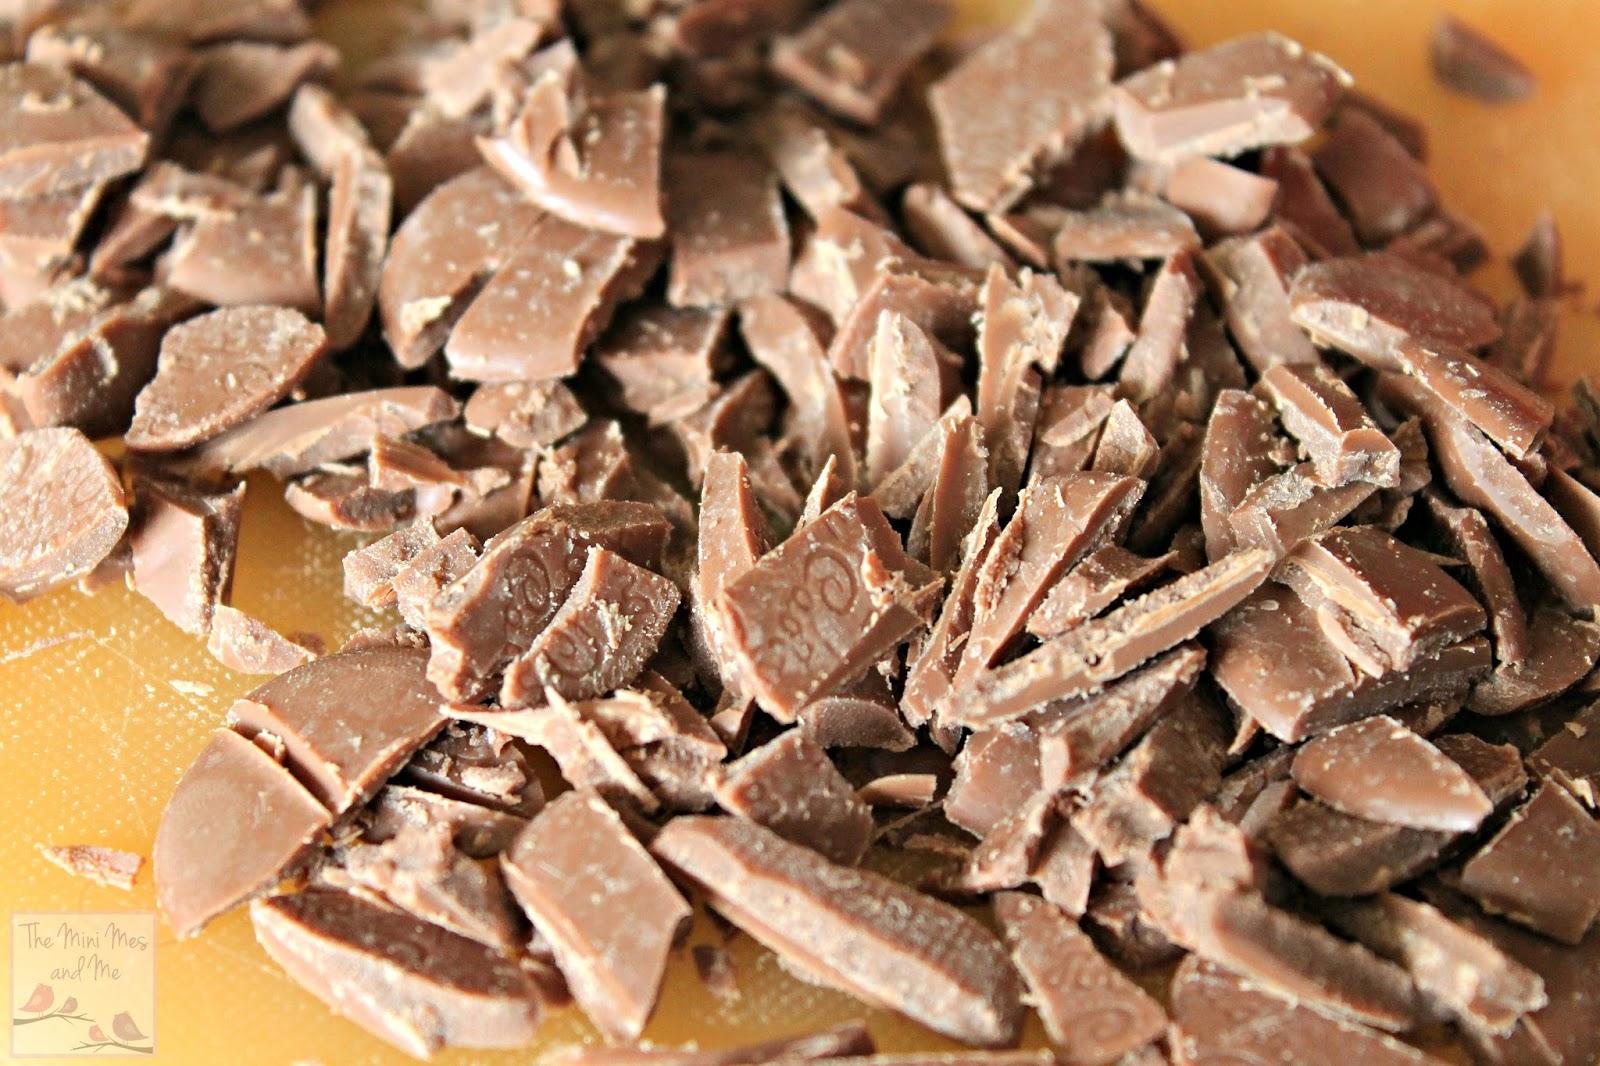 Cadbury chocolate buttons chopped